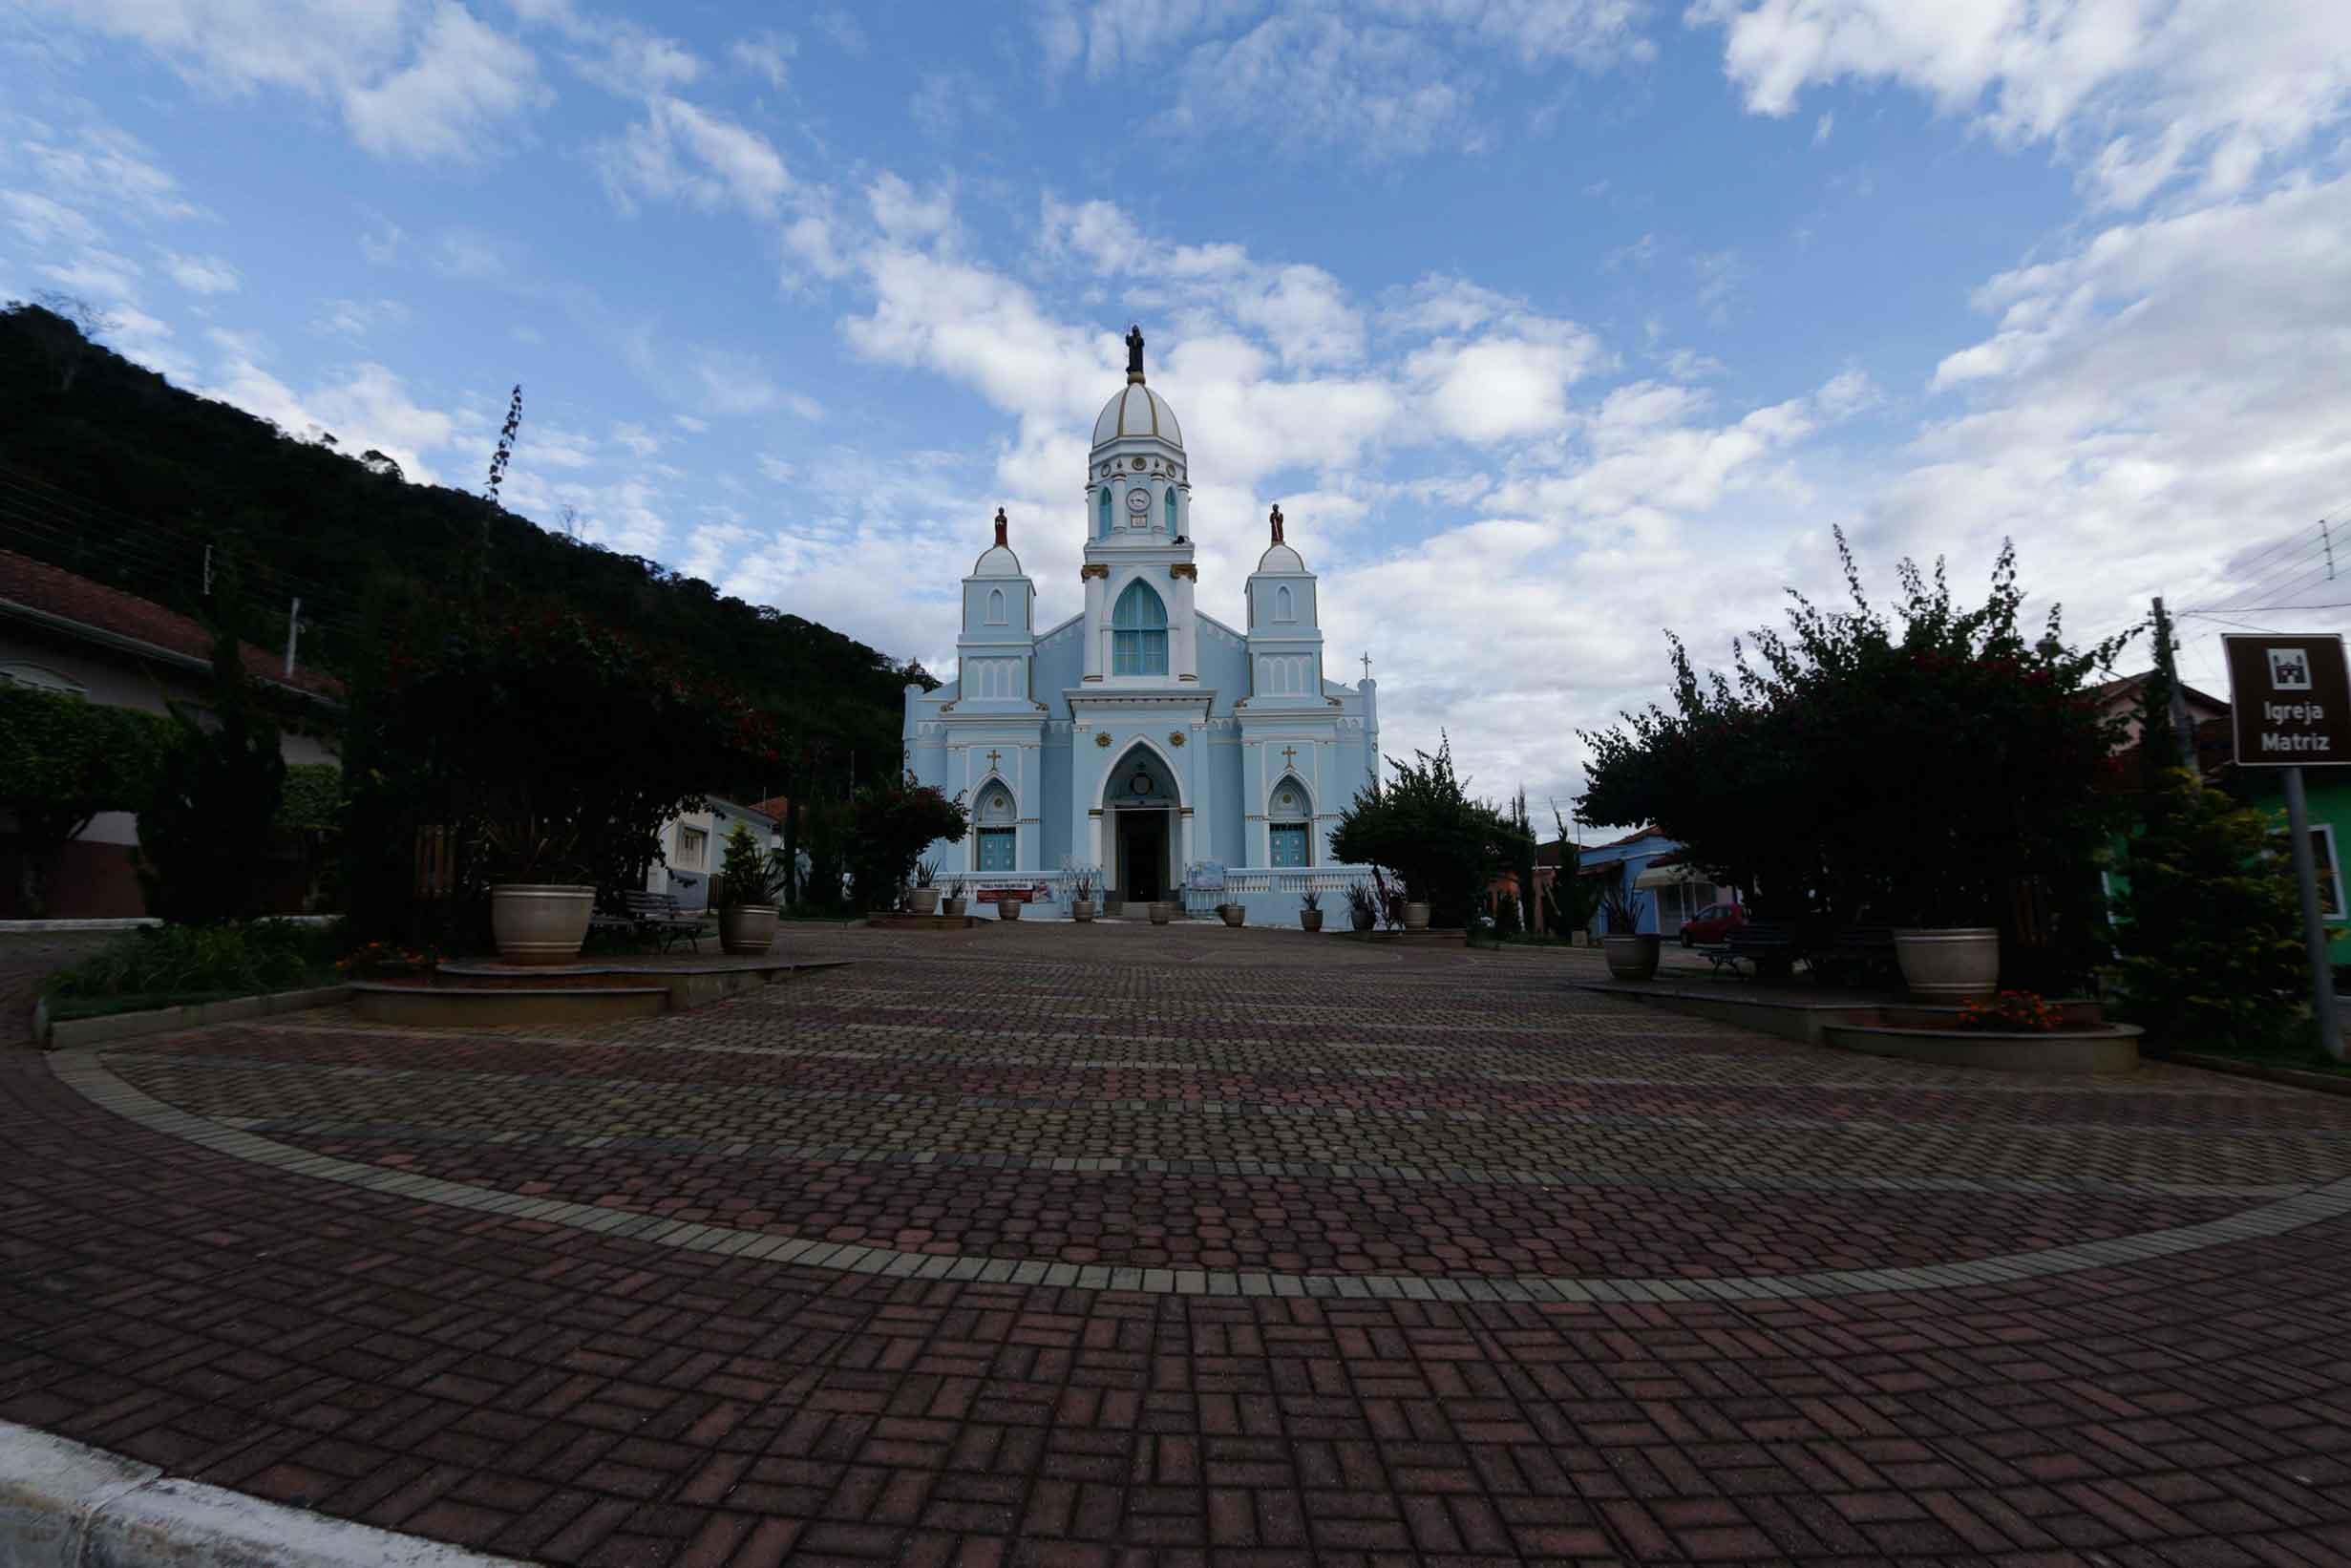 Sao-Bento-do-Sapucai-Turismo-Religioso-Igreja-Matriz-_MG_6316-bx